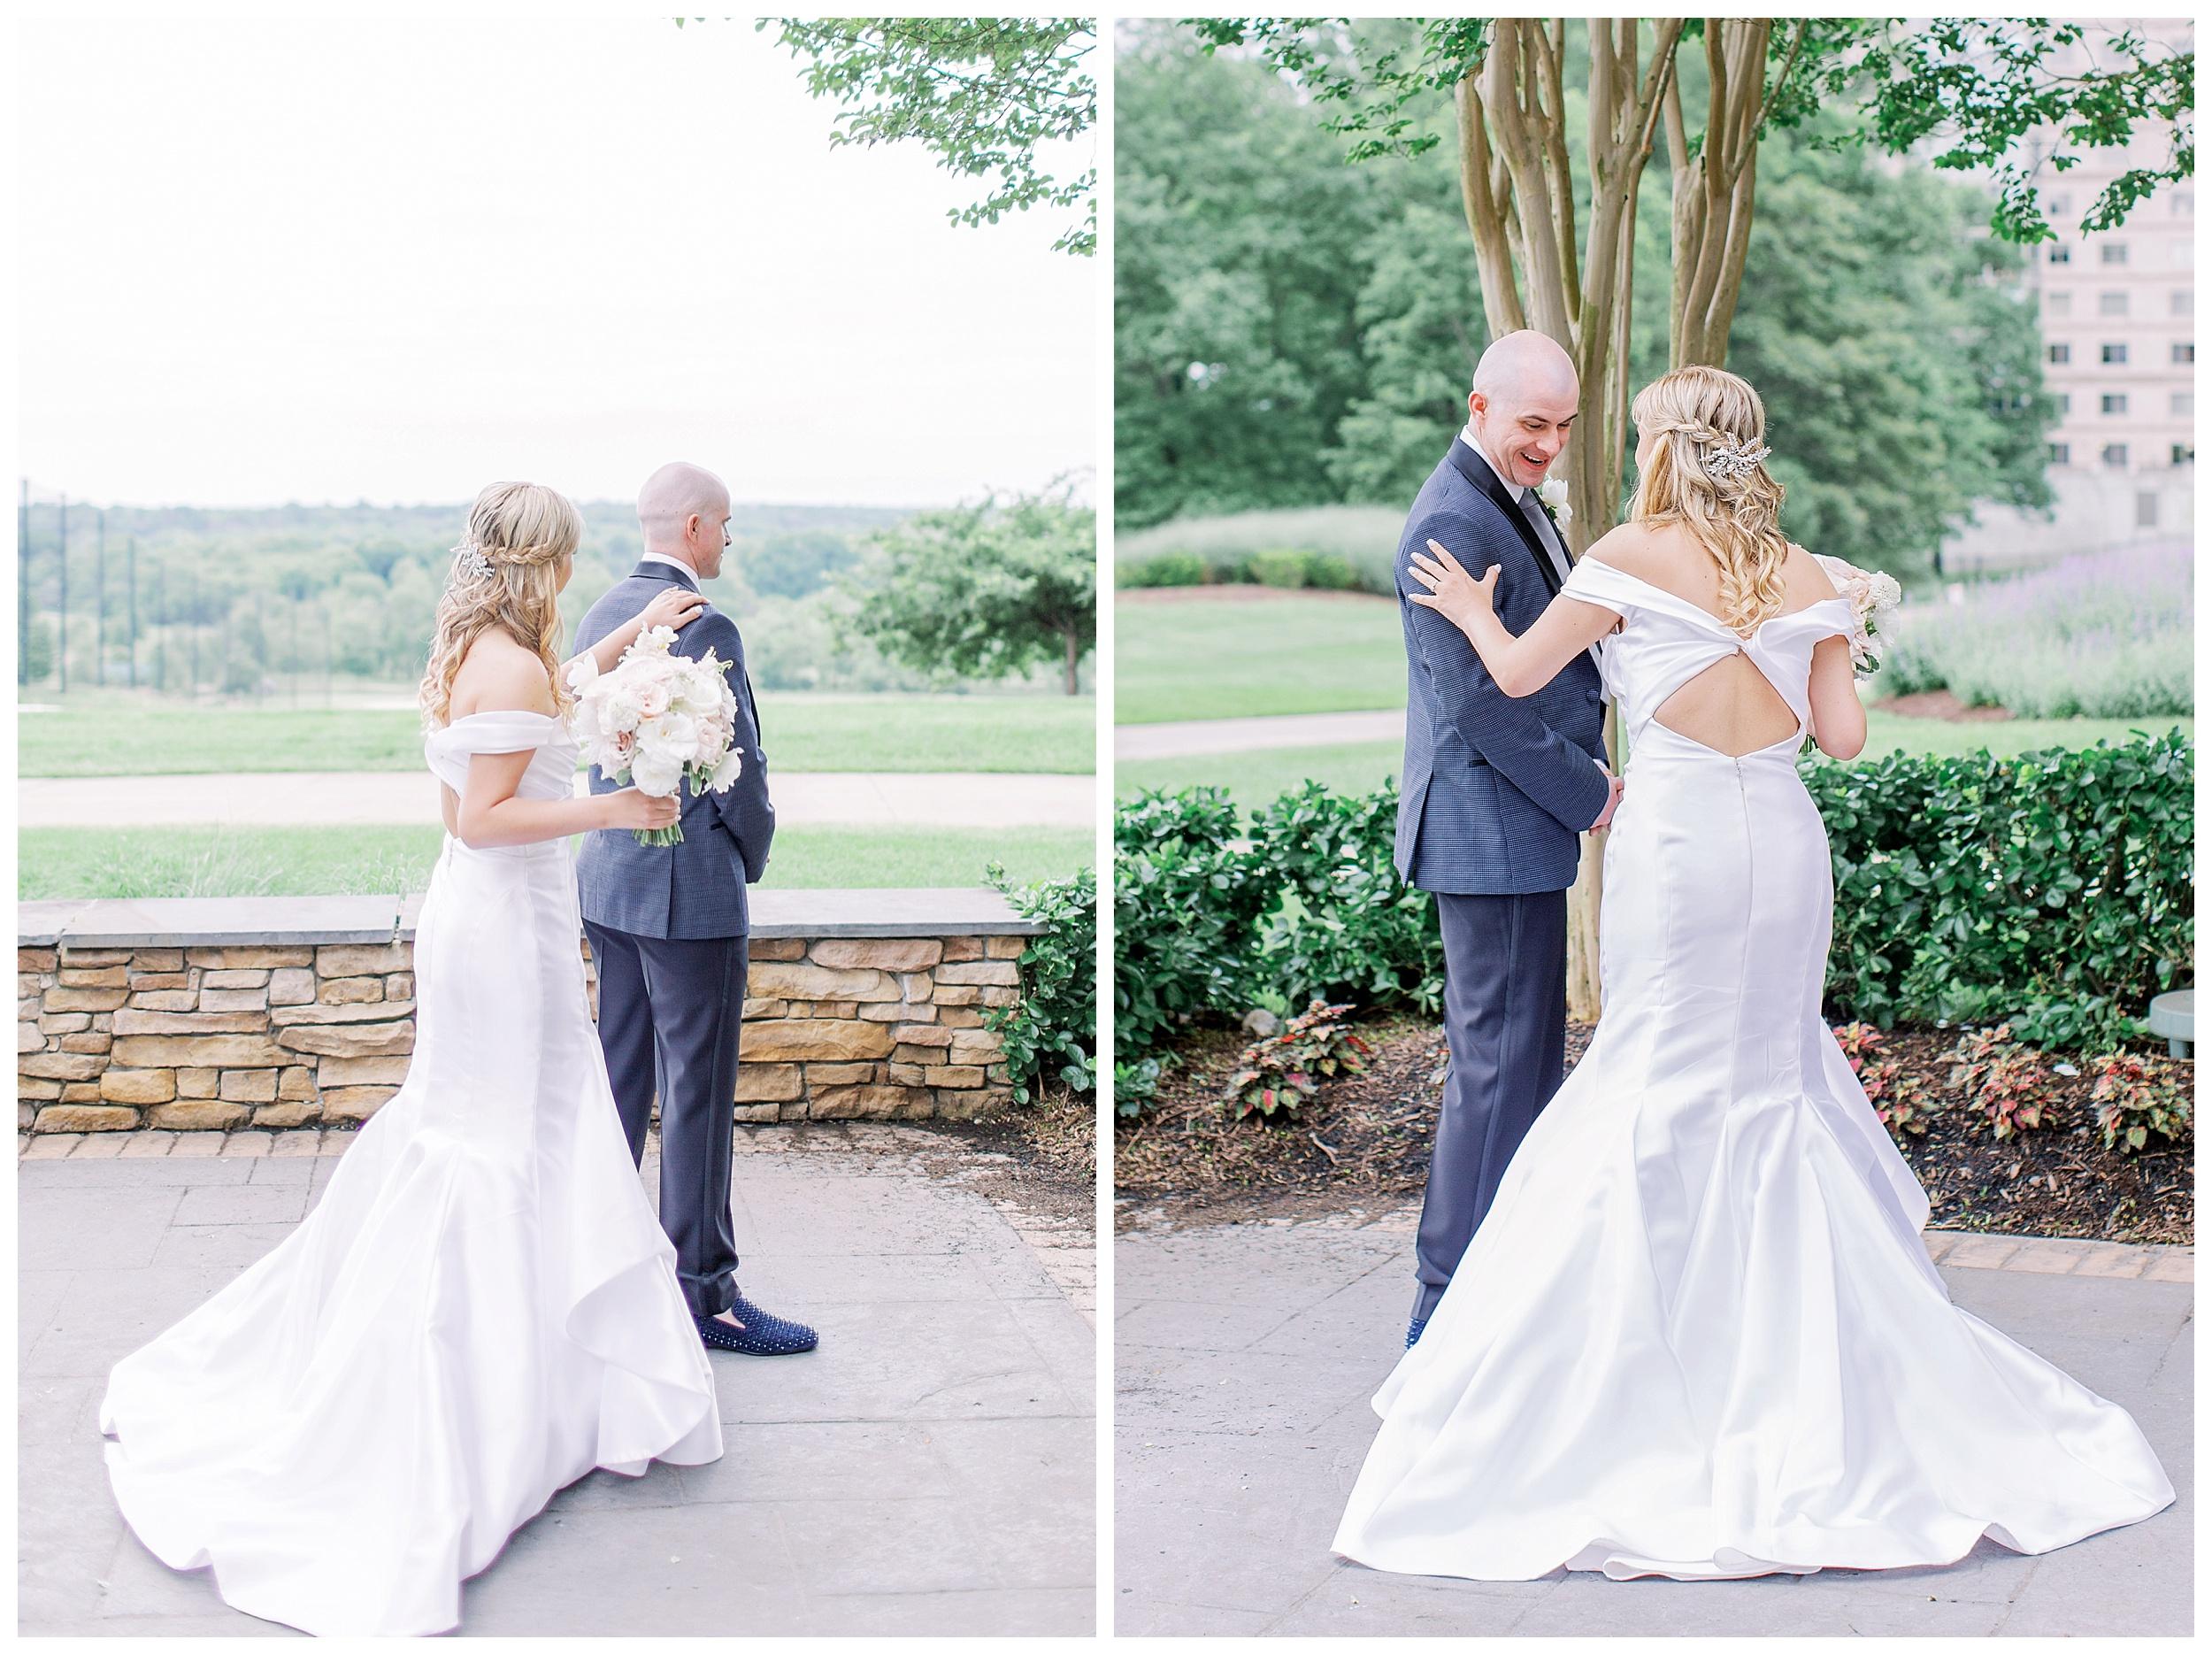 Lansdowne Resort Wedding | Virginia Film Wedding Photographer Kir Tuben_0032.jpg